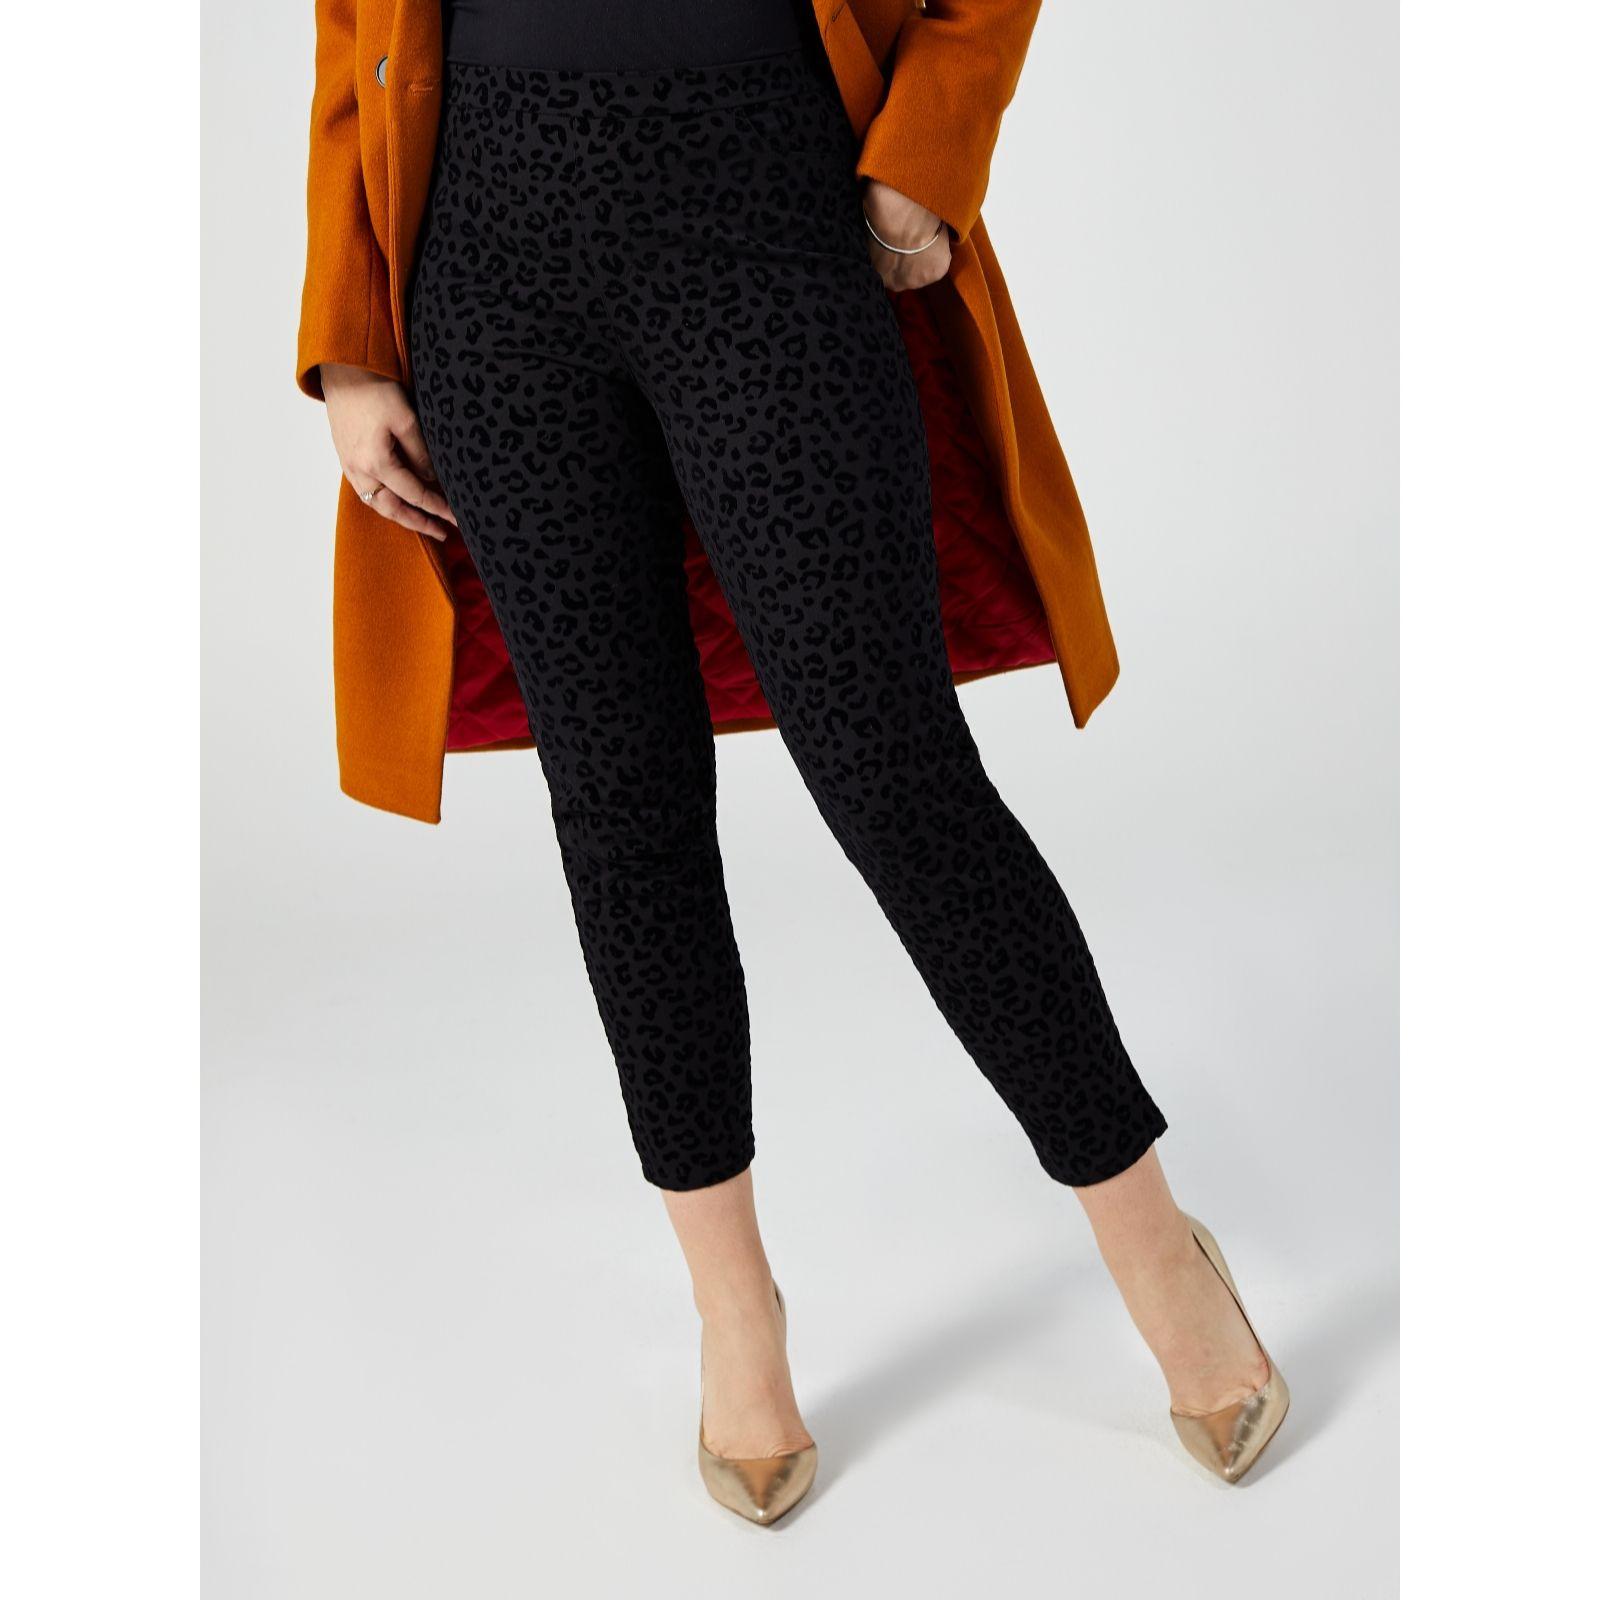 Size 14 New Black Isaac Mizrahi  Live QVC 24//7 Stretch Petite  Crop Trousers